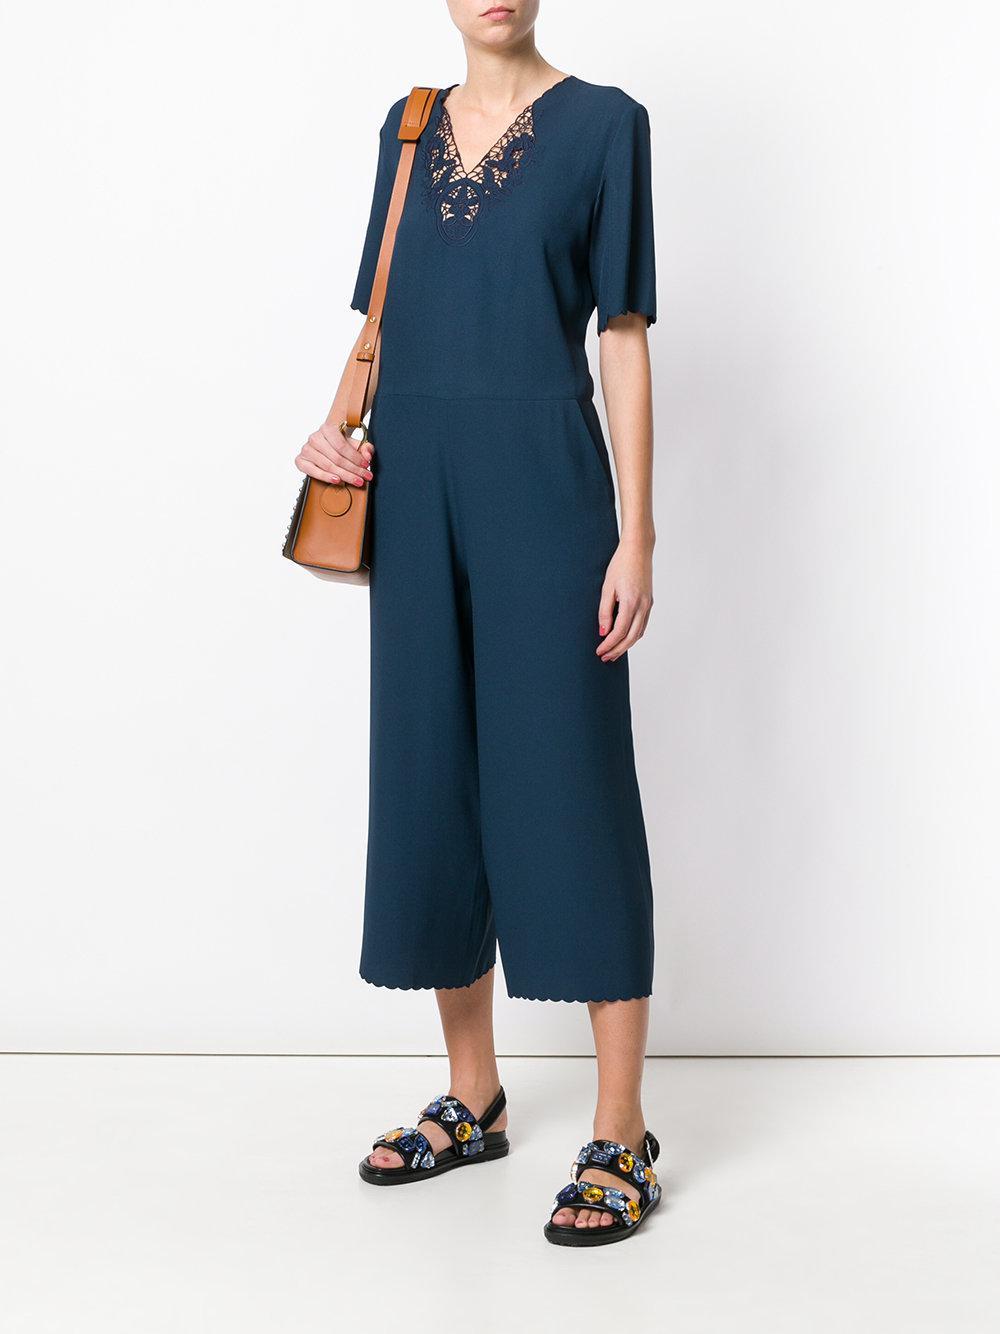 aa45e69ad8e Lyst - M.i.h Jeans Eva Jumpsuit in Blue